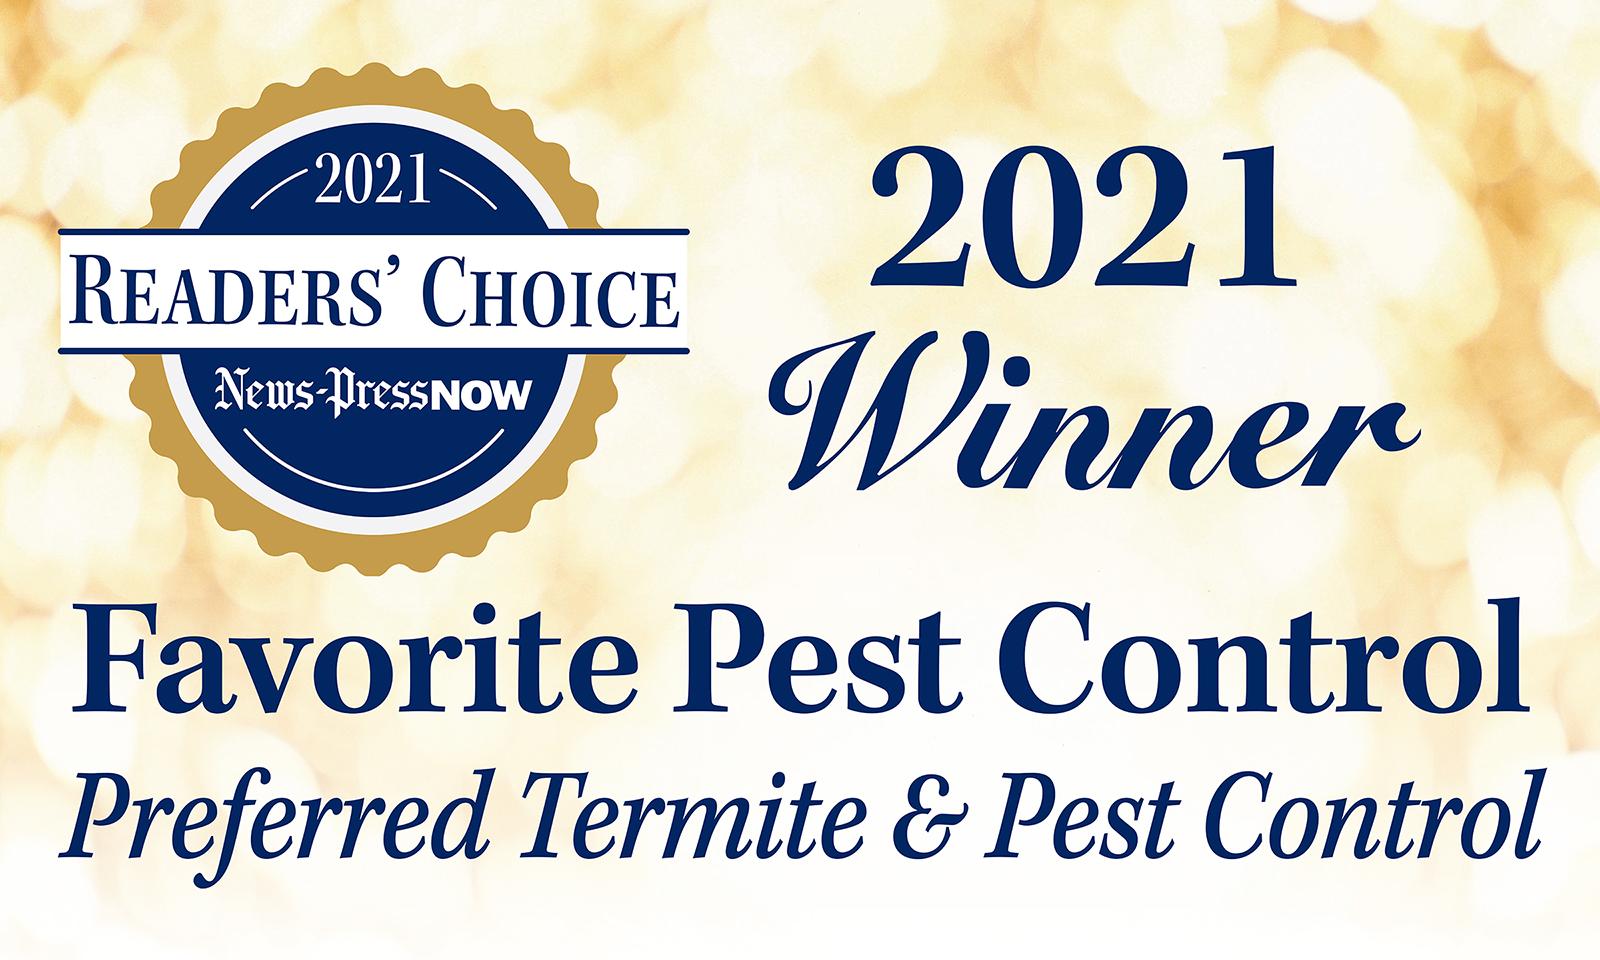 Preferred Termite CLEAN COPY TO SOCIAL